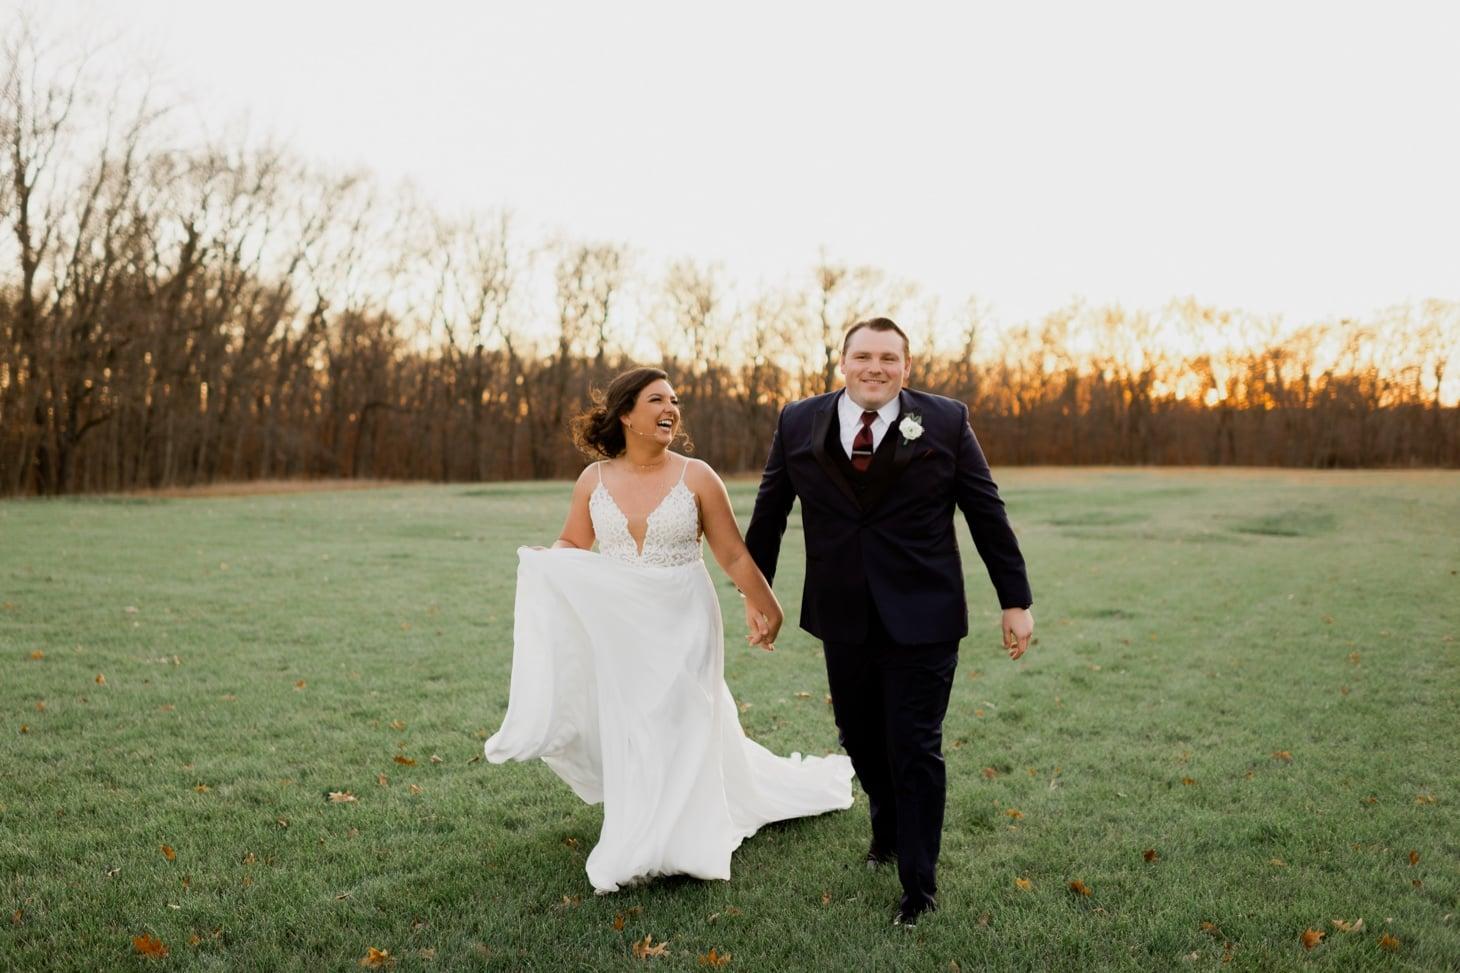 bride and groom sunset photos adel iowa